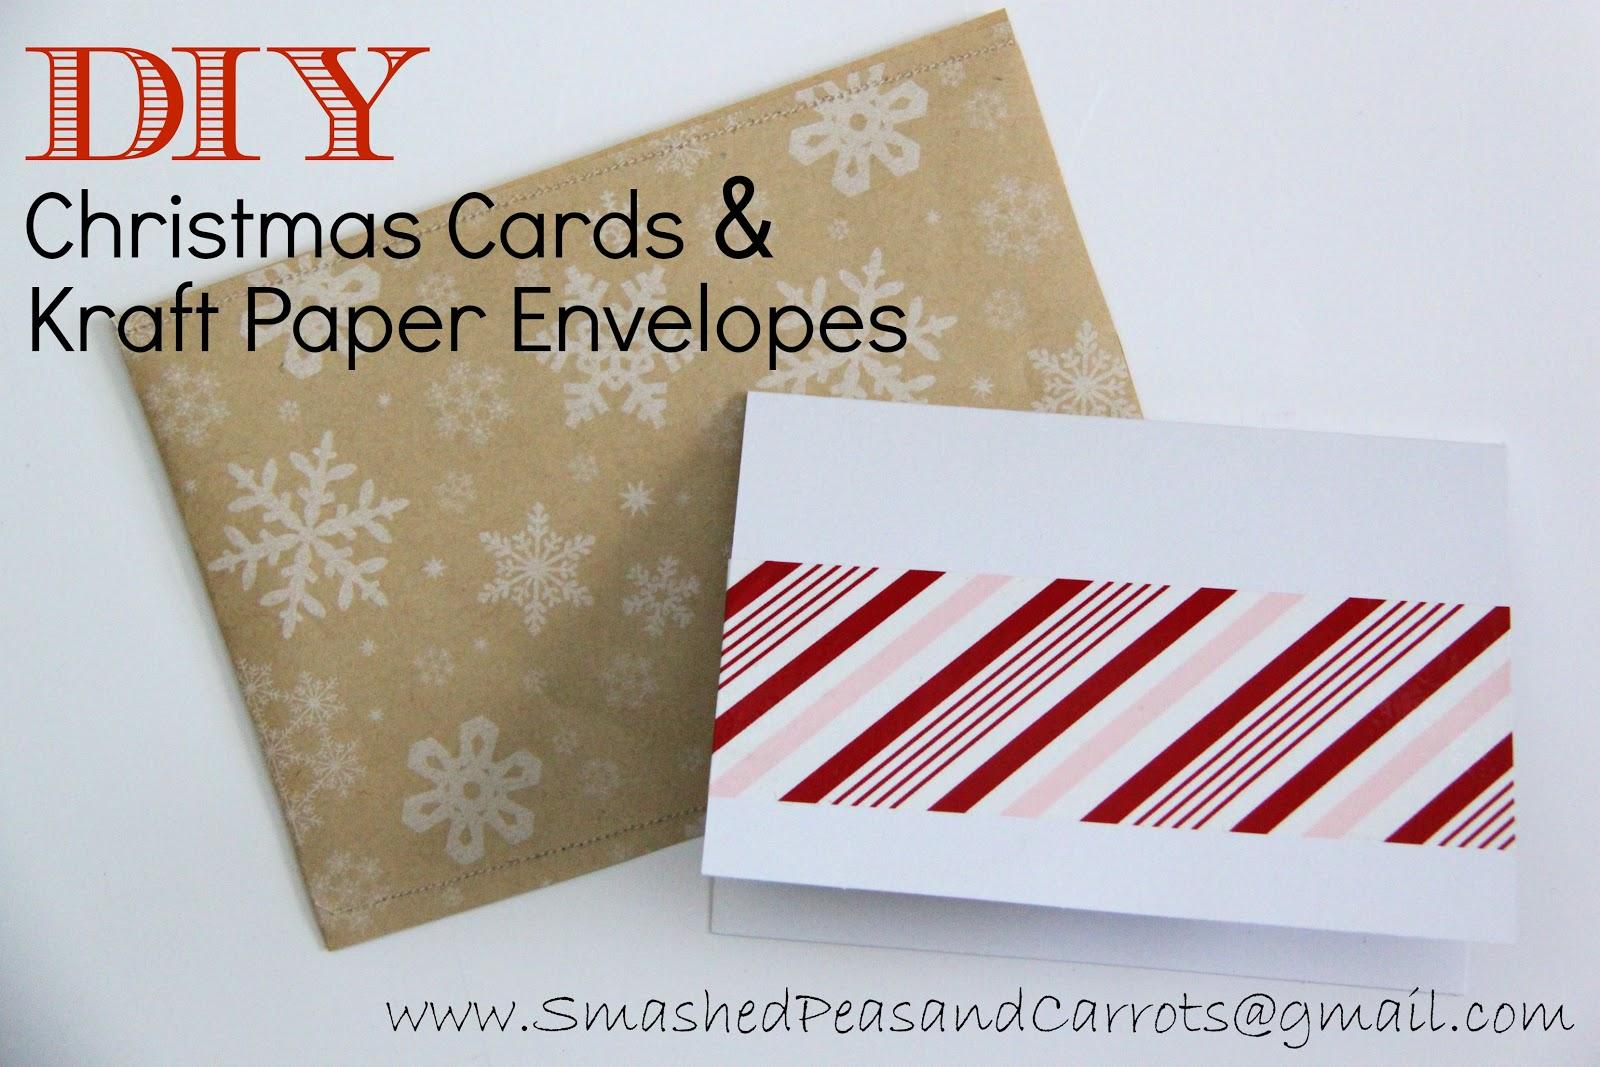 DIY Christmas Cards And Kraft Paper Envelopes TUTORIAL